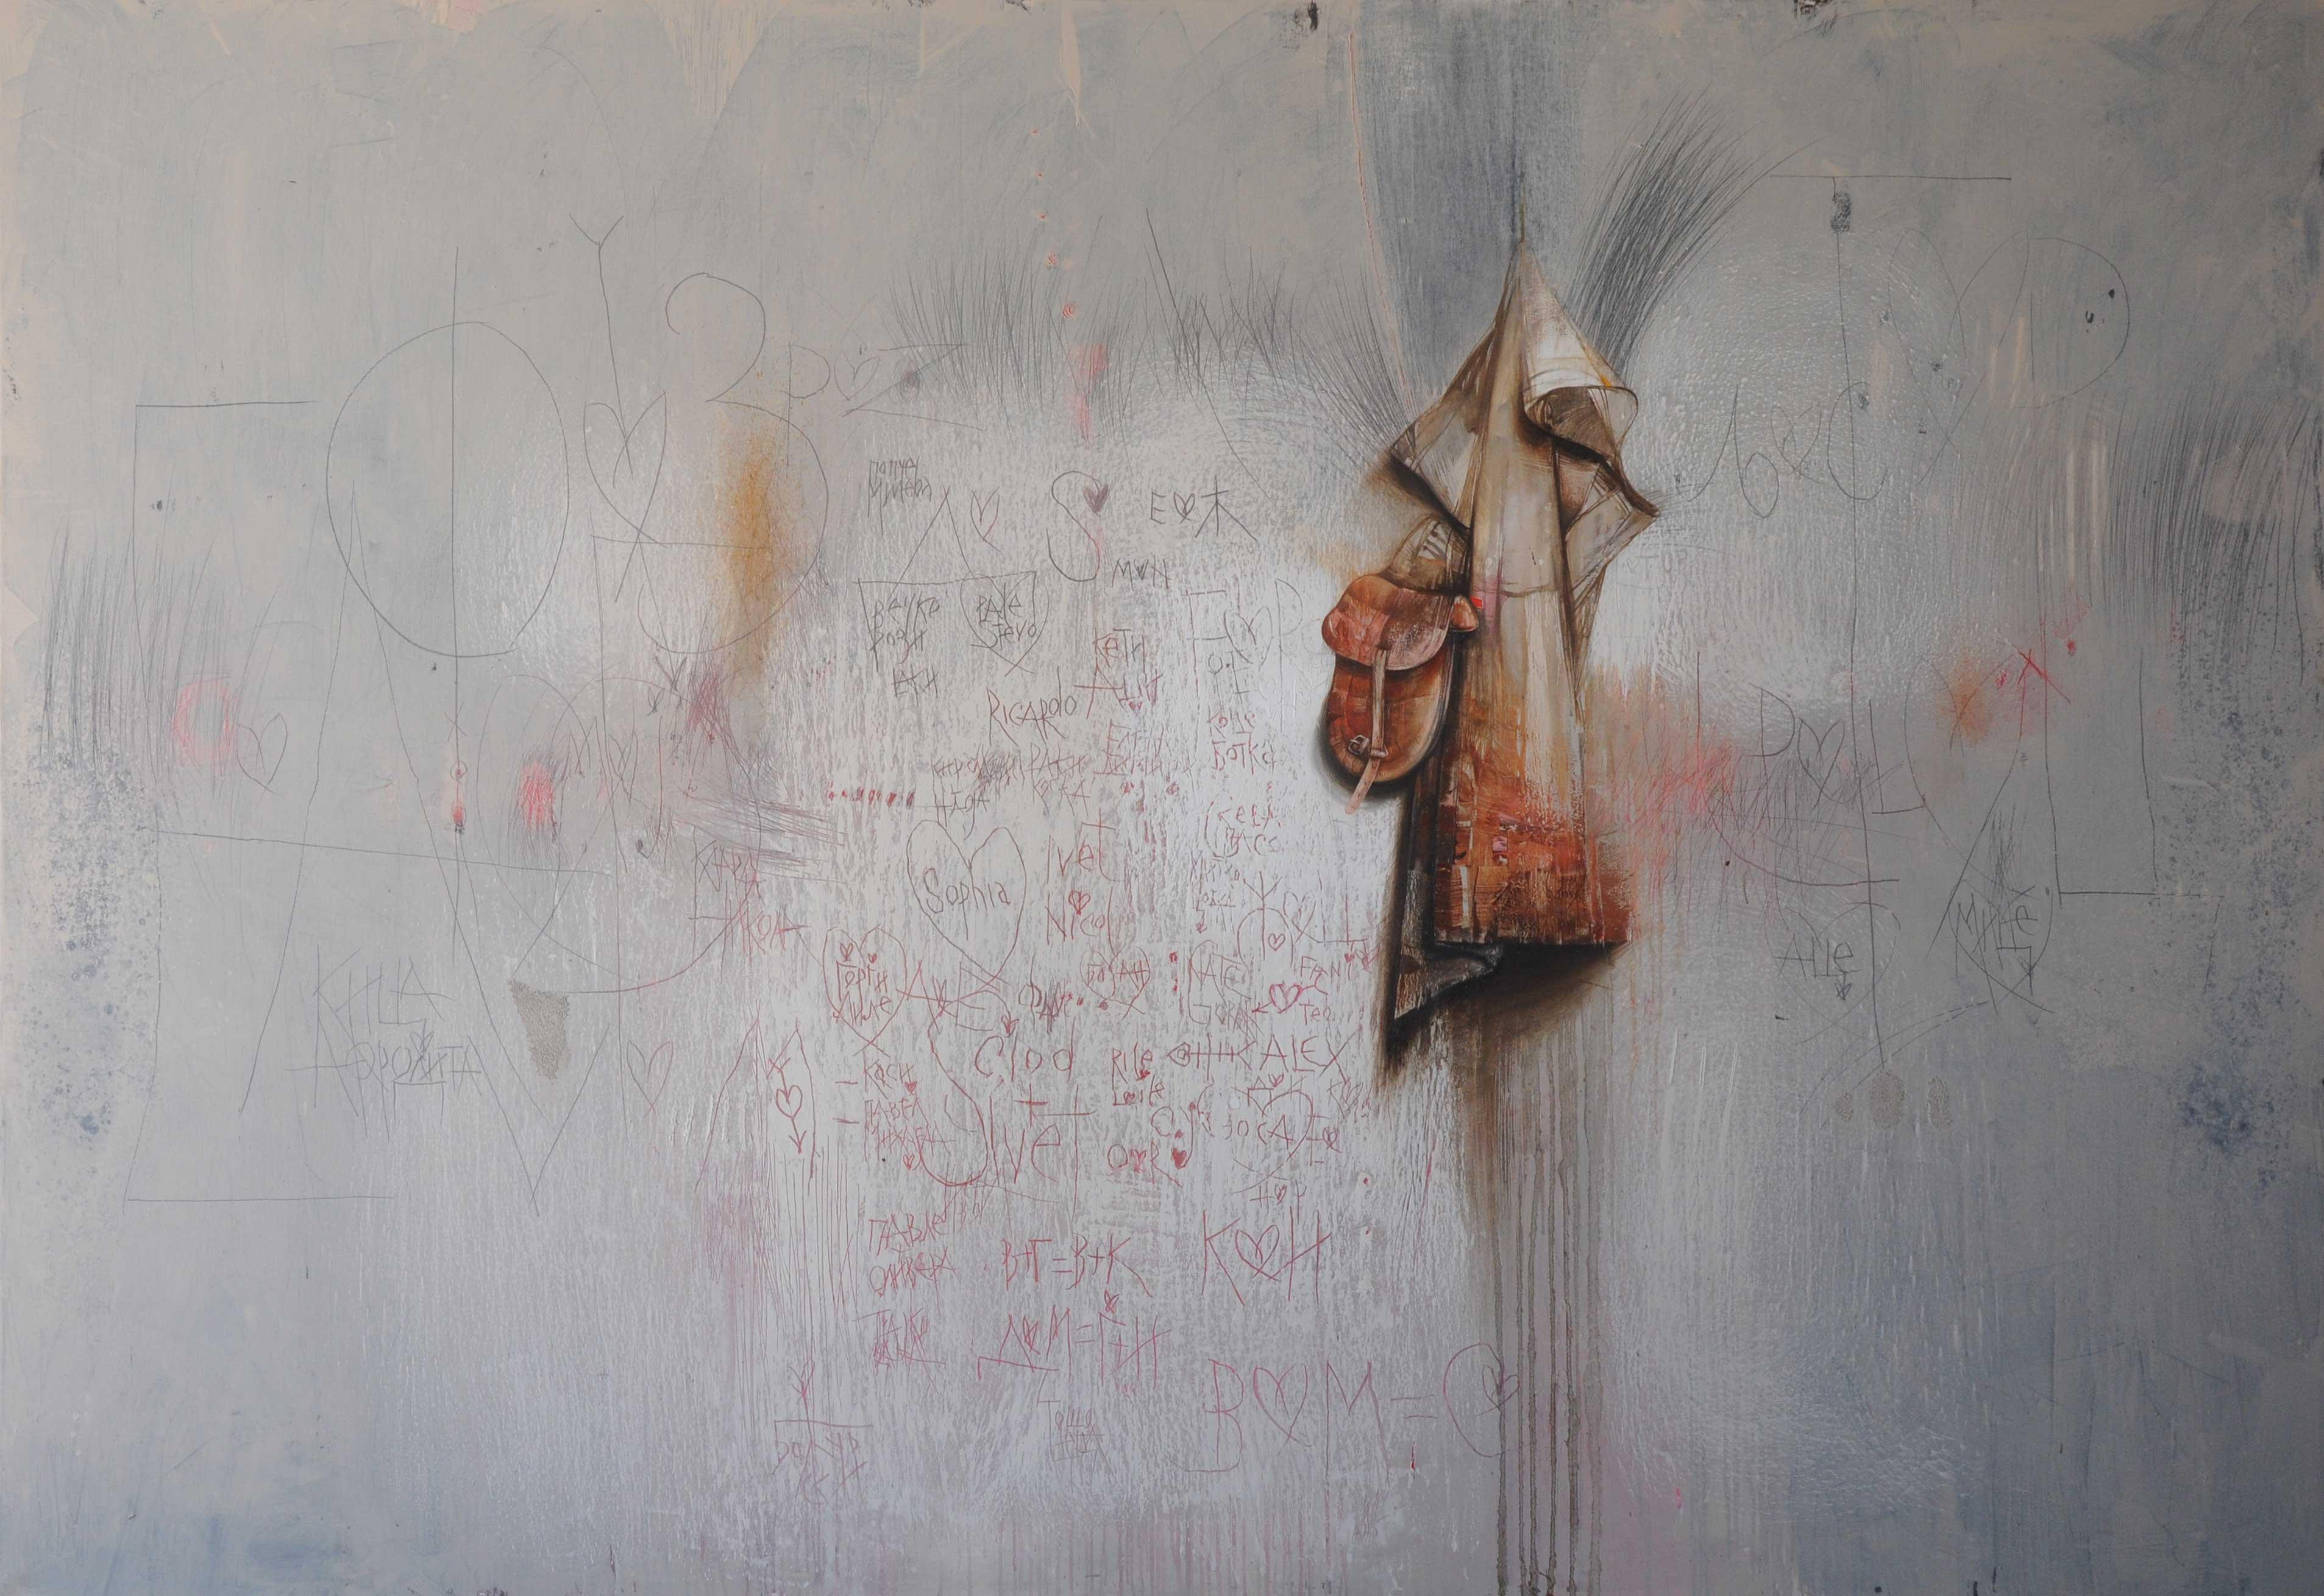 Goce BOZURSKI, В+М=С, 2015, acrylic on canvas, 195 x 285 cm